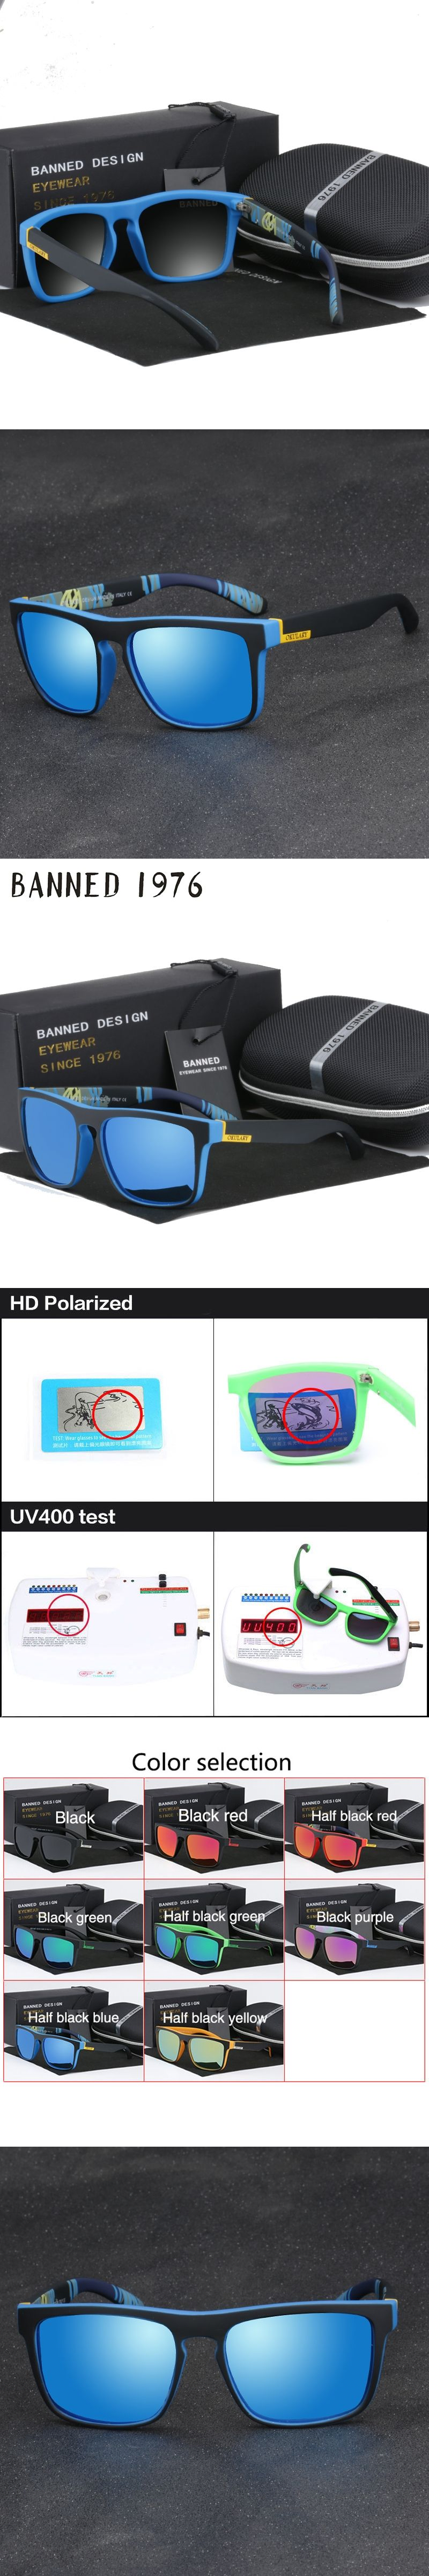 217ad73e0cbf8 2018 Men Vintage HD Polarized Sunglasses aviator Brand Sun glasses wayfare  Lens Driving Shades For Men